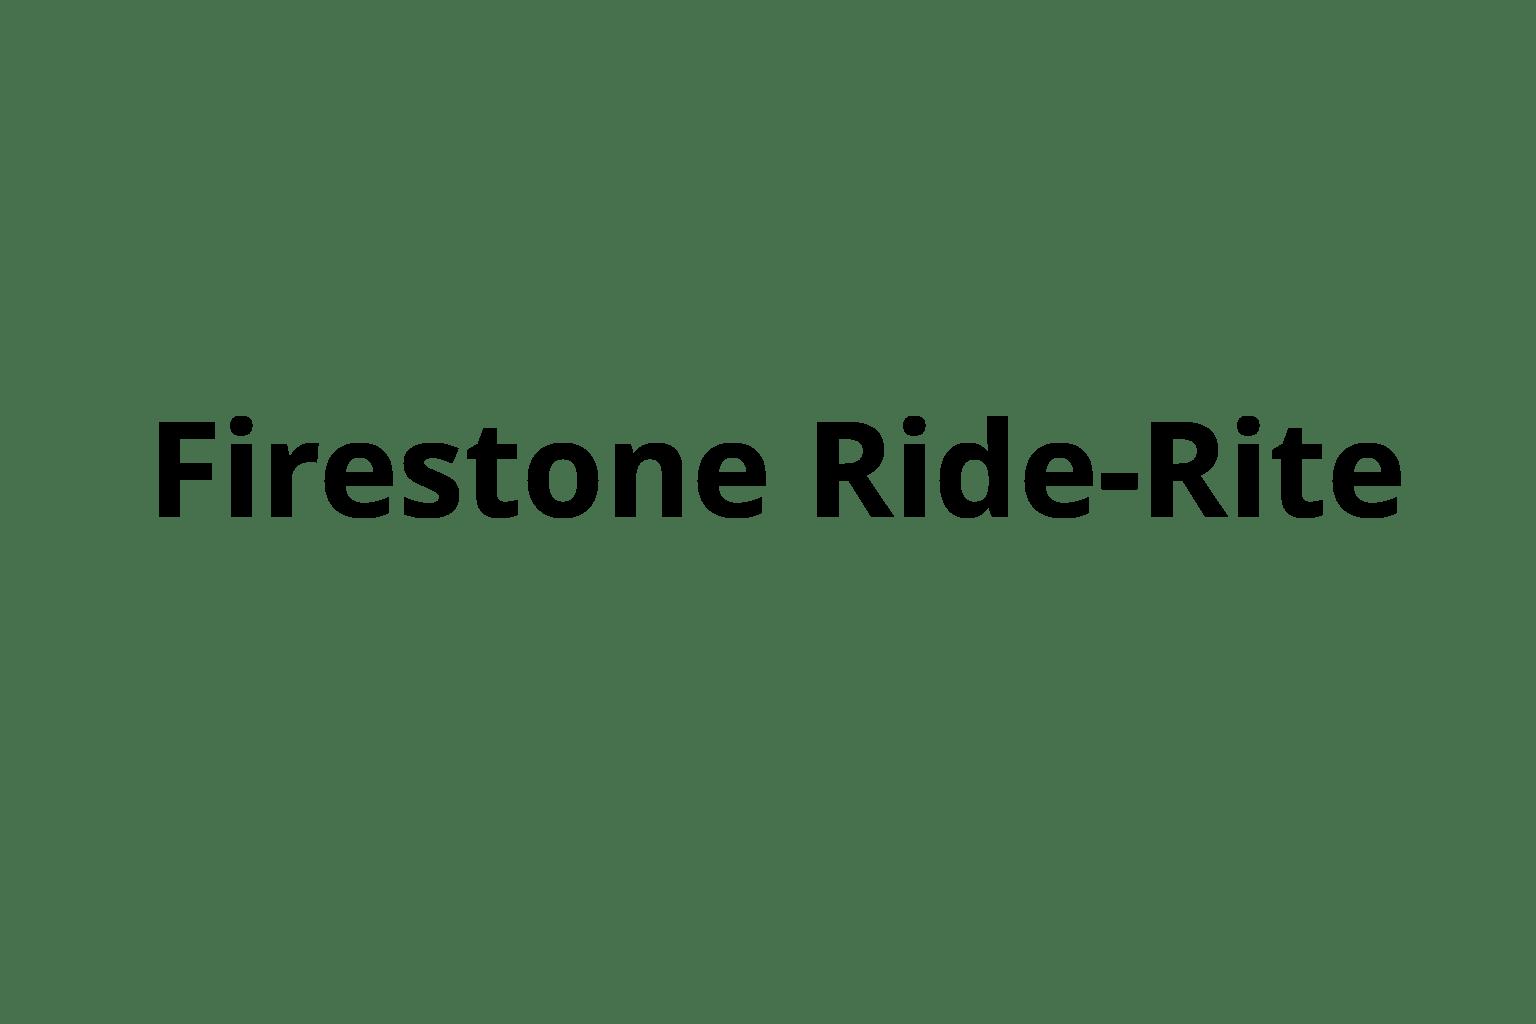 Firestone Ride-Rite